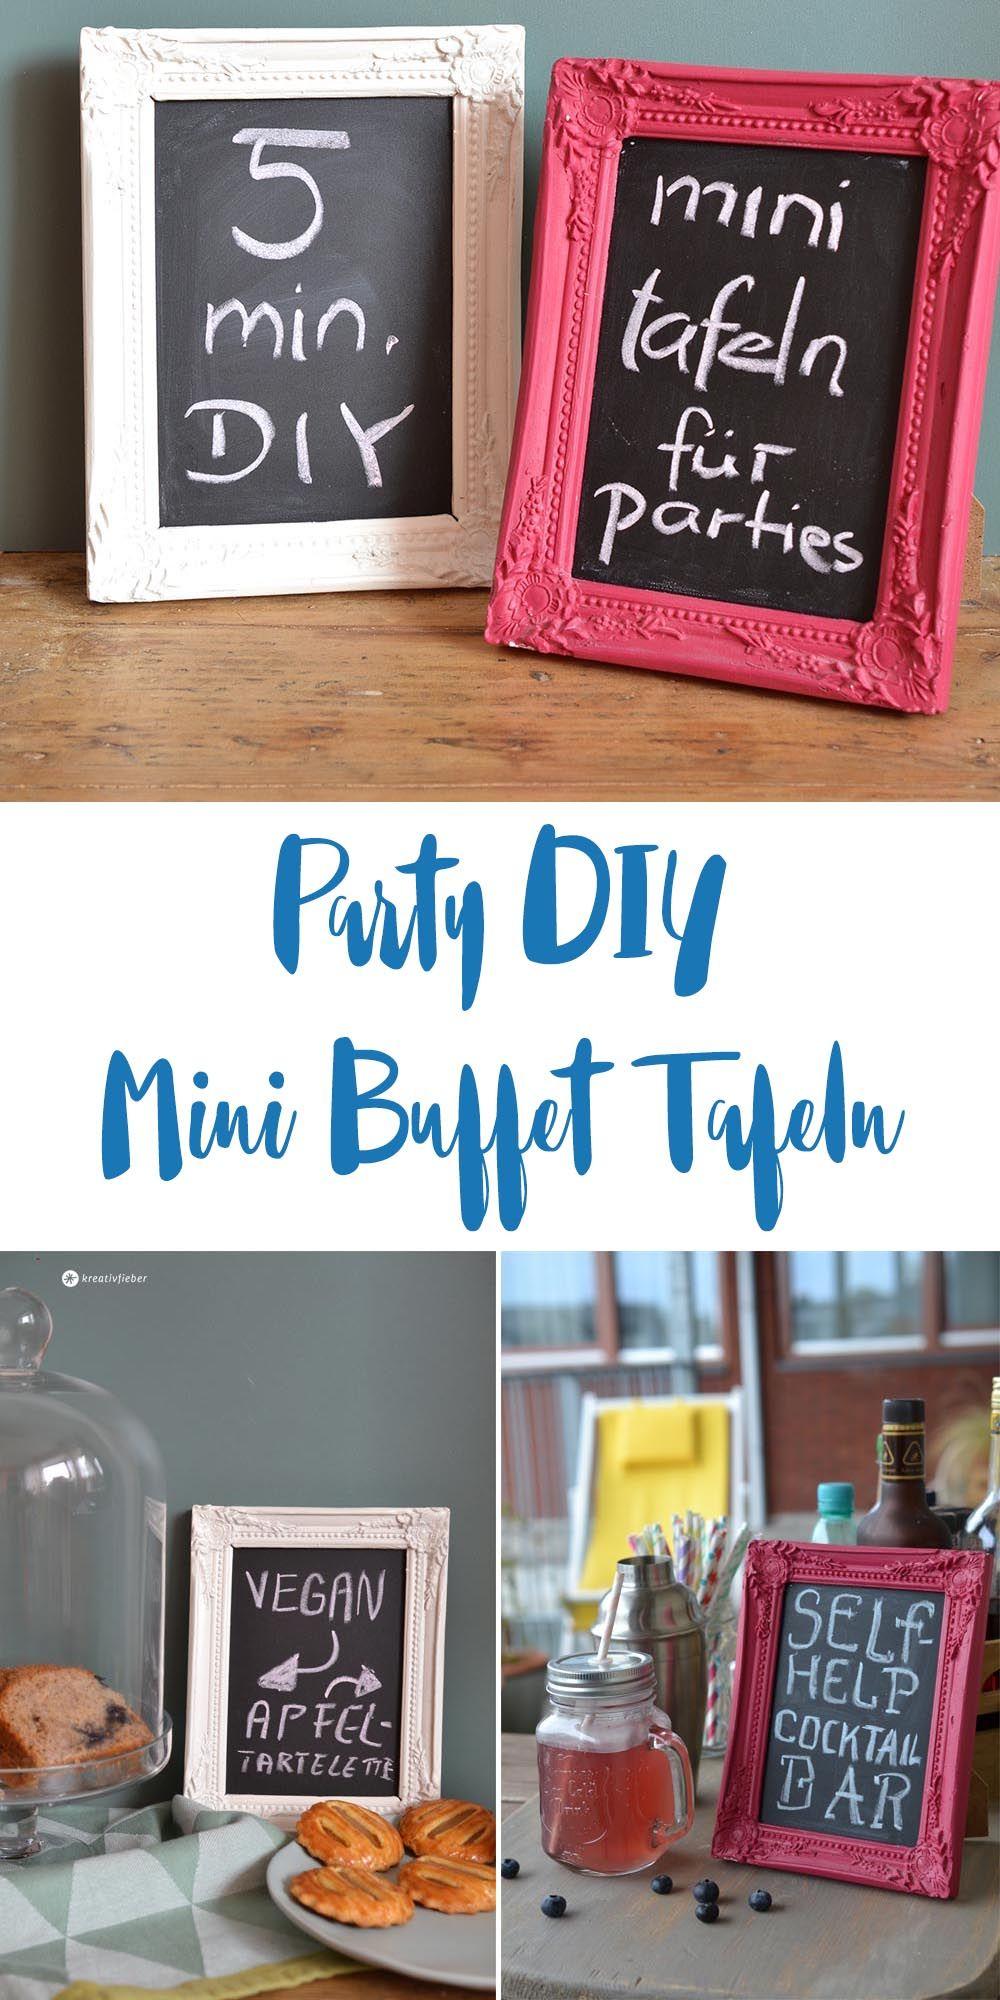 DIY Mini Tafeln für Parties und Buffets #dressesforengagementparty